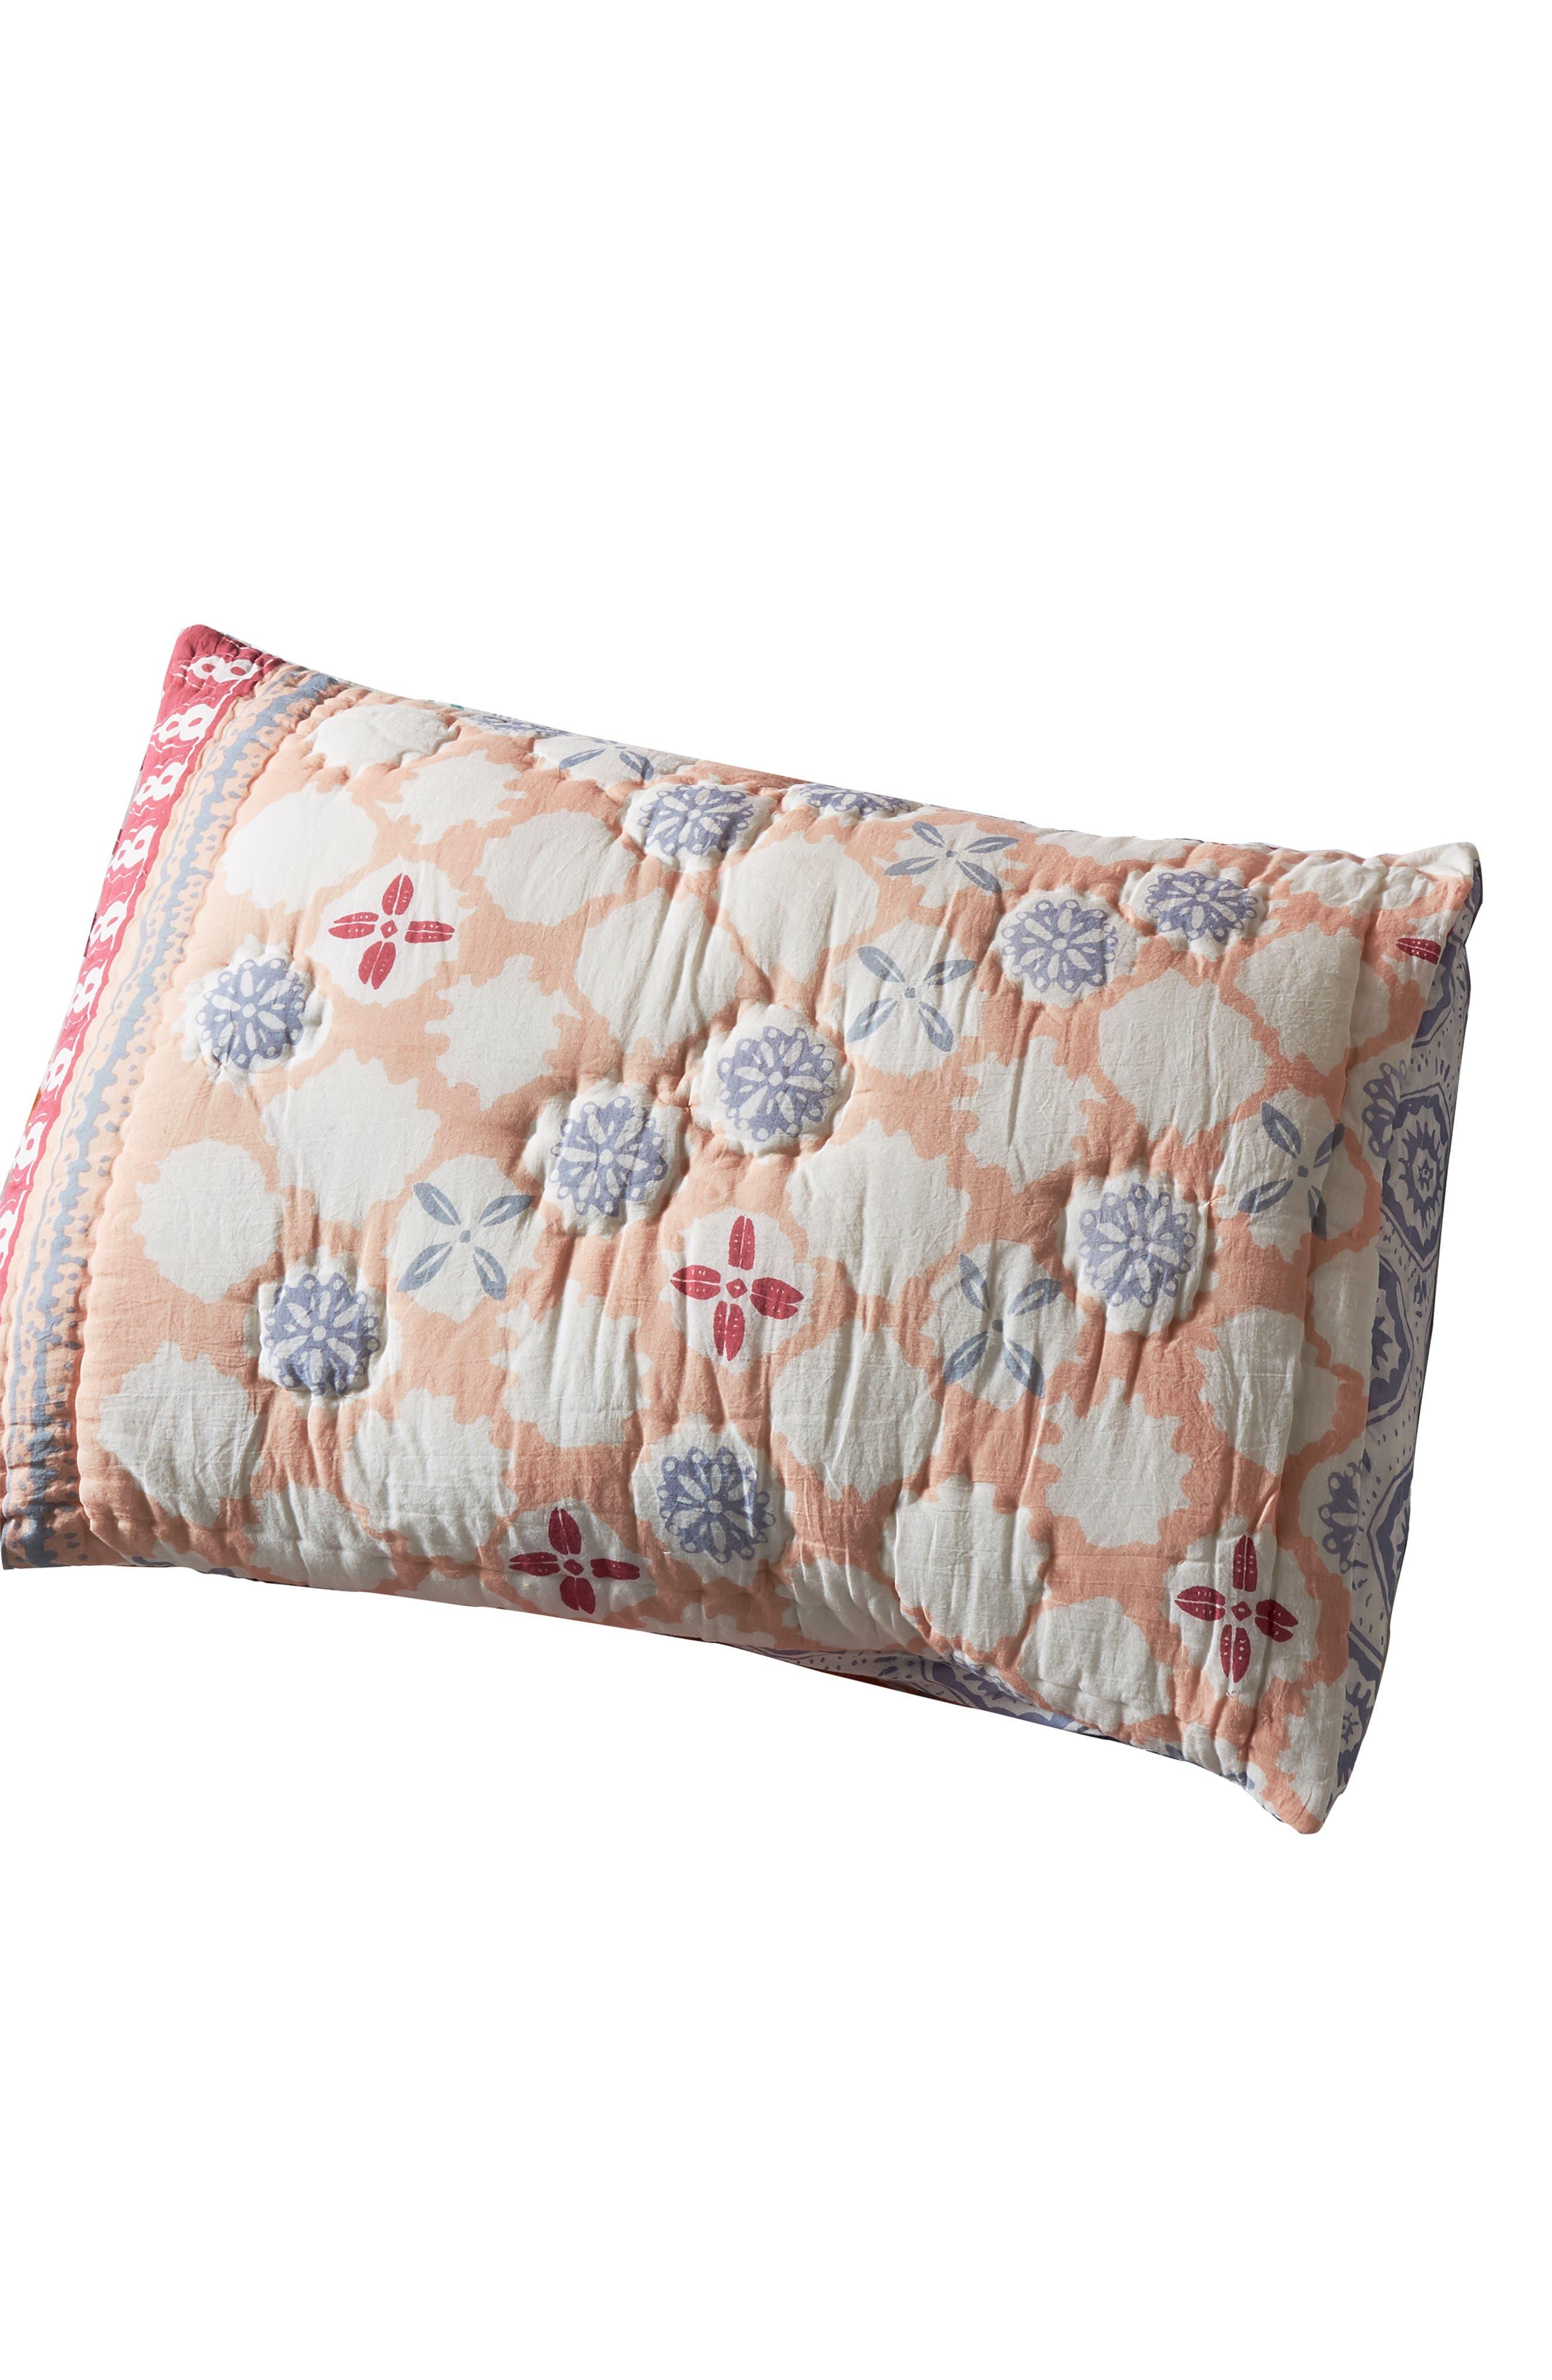 Laterza Pillow Shams,                             Main thumbnail 1, color,                             BLUE MULTI